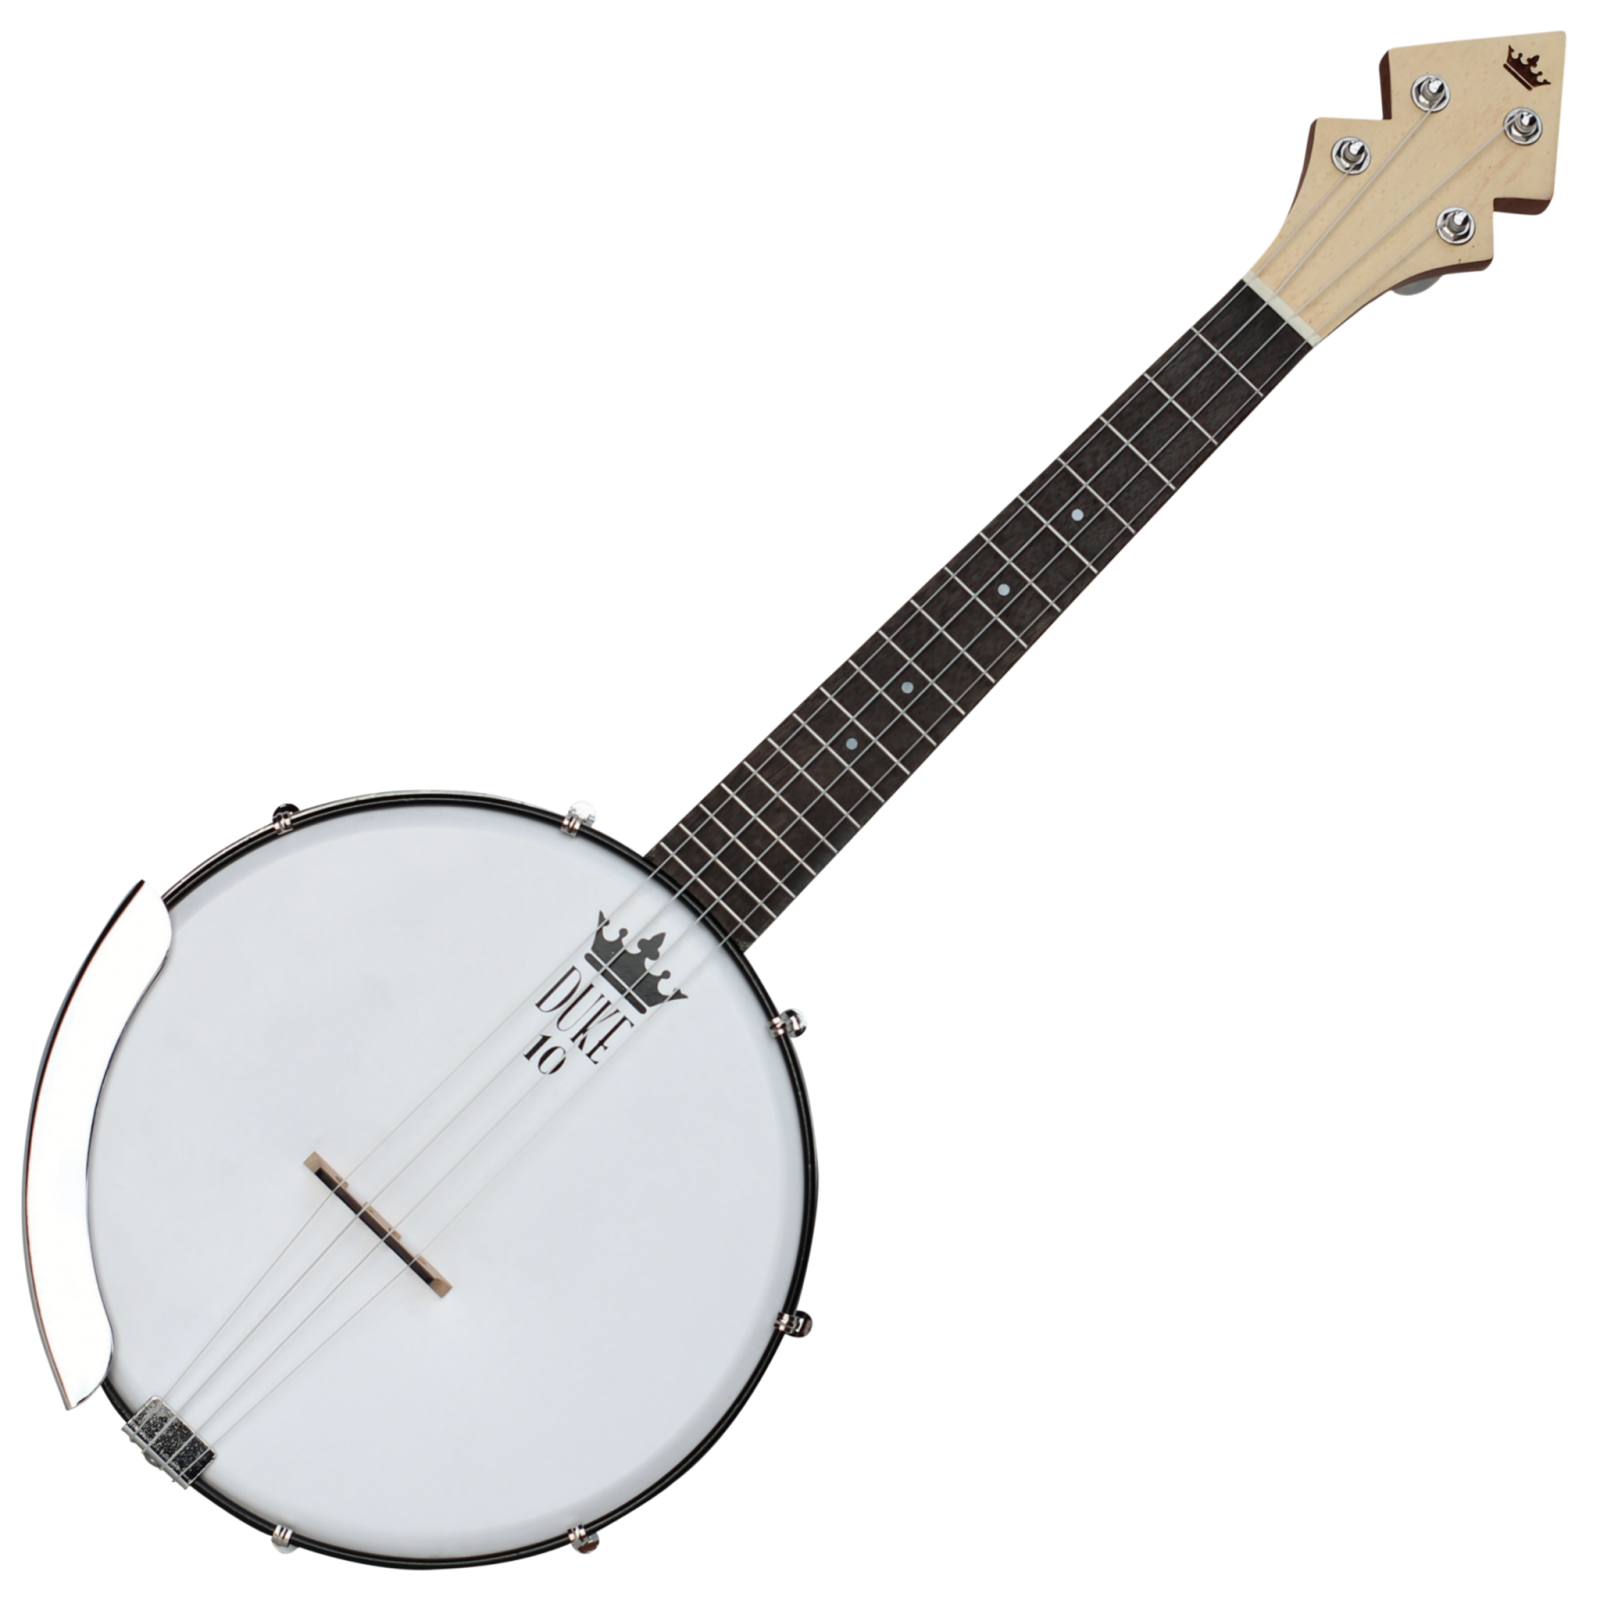 DUKE10 Tenor Banjo-Ukulele w/Pickup & Bag